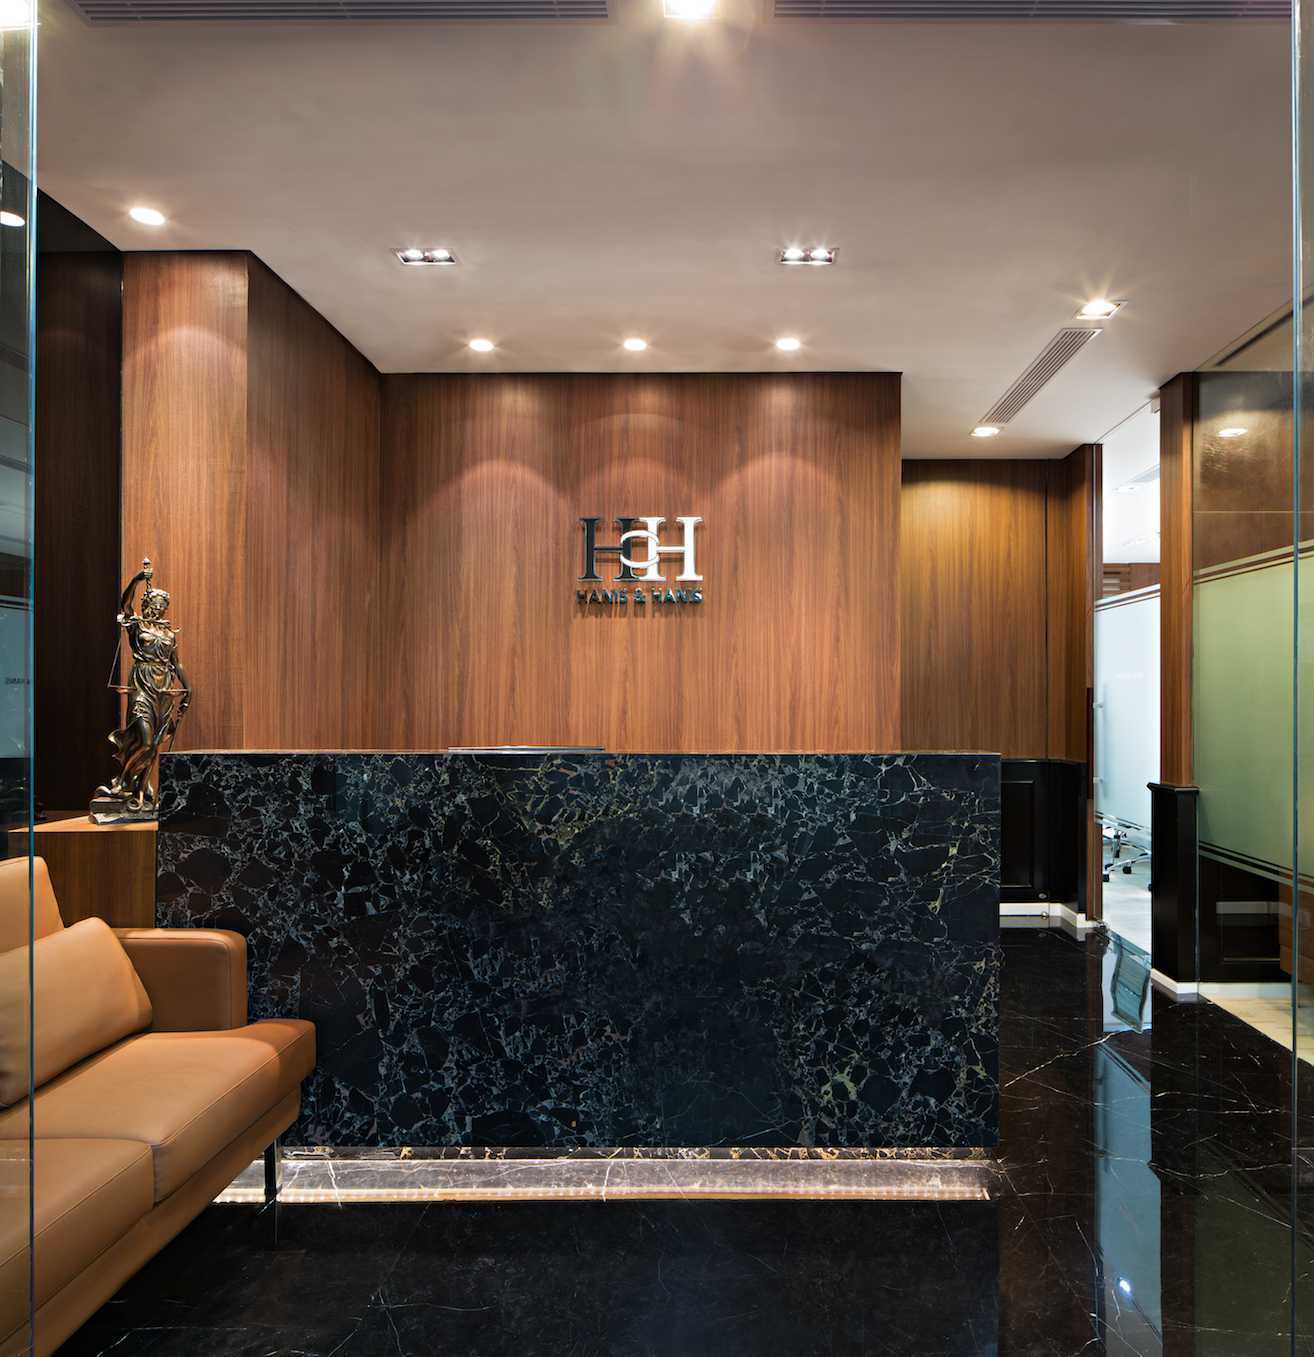 Pt Asa Adiguna Hanis & Hanis Advocate Sarinah Building Sarinah Building Reception Area Minimalis  24578